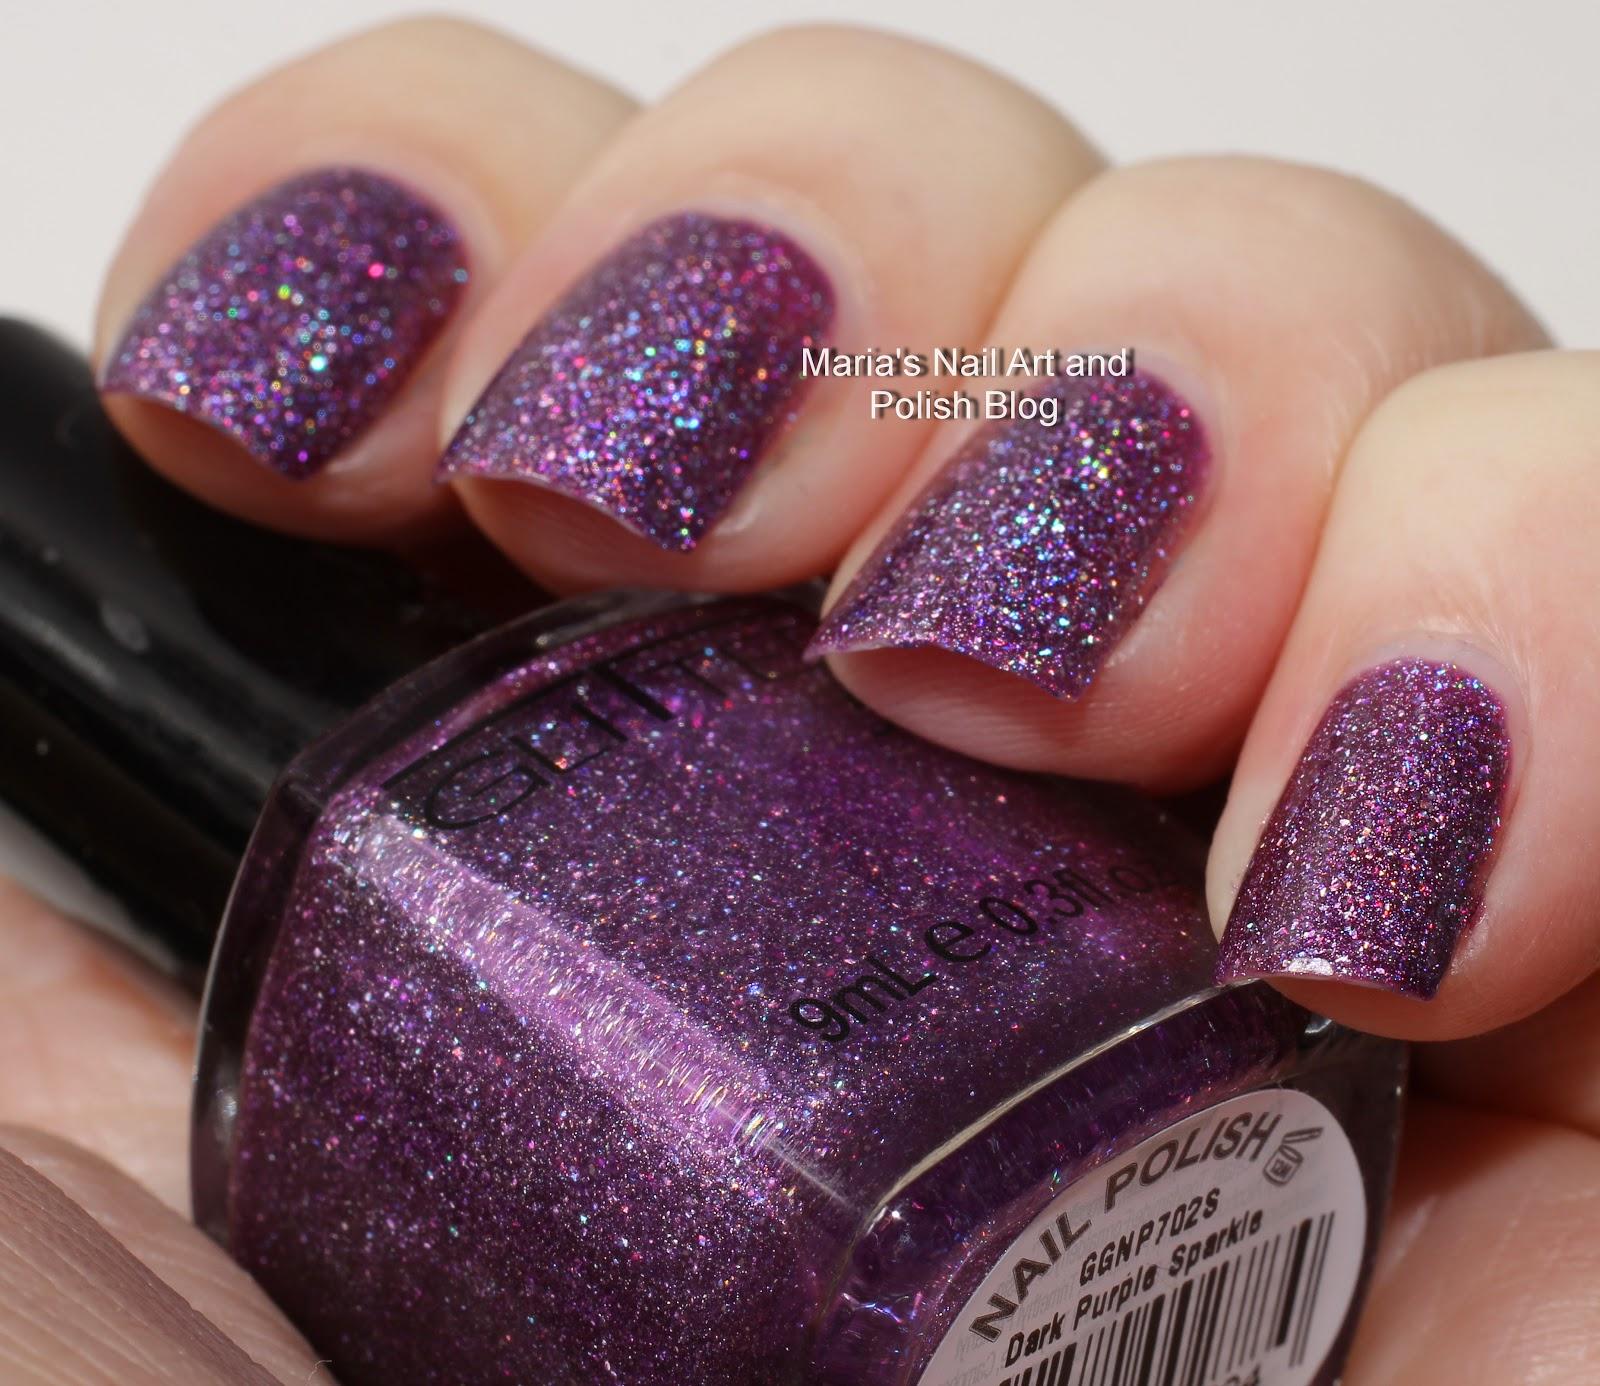 Marias Nail Art and Polish Blog: Glitter Gal Dark Purple Sparkle ...